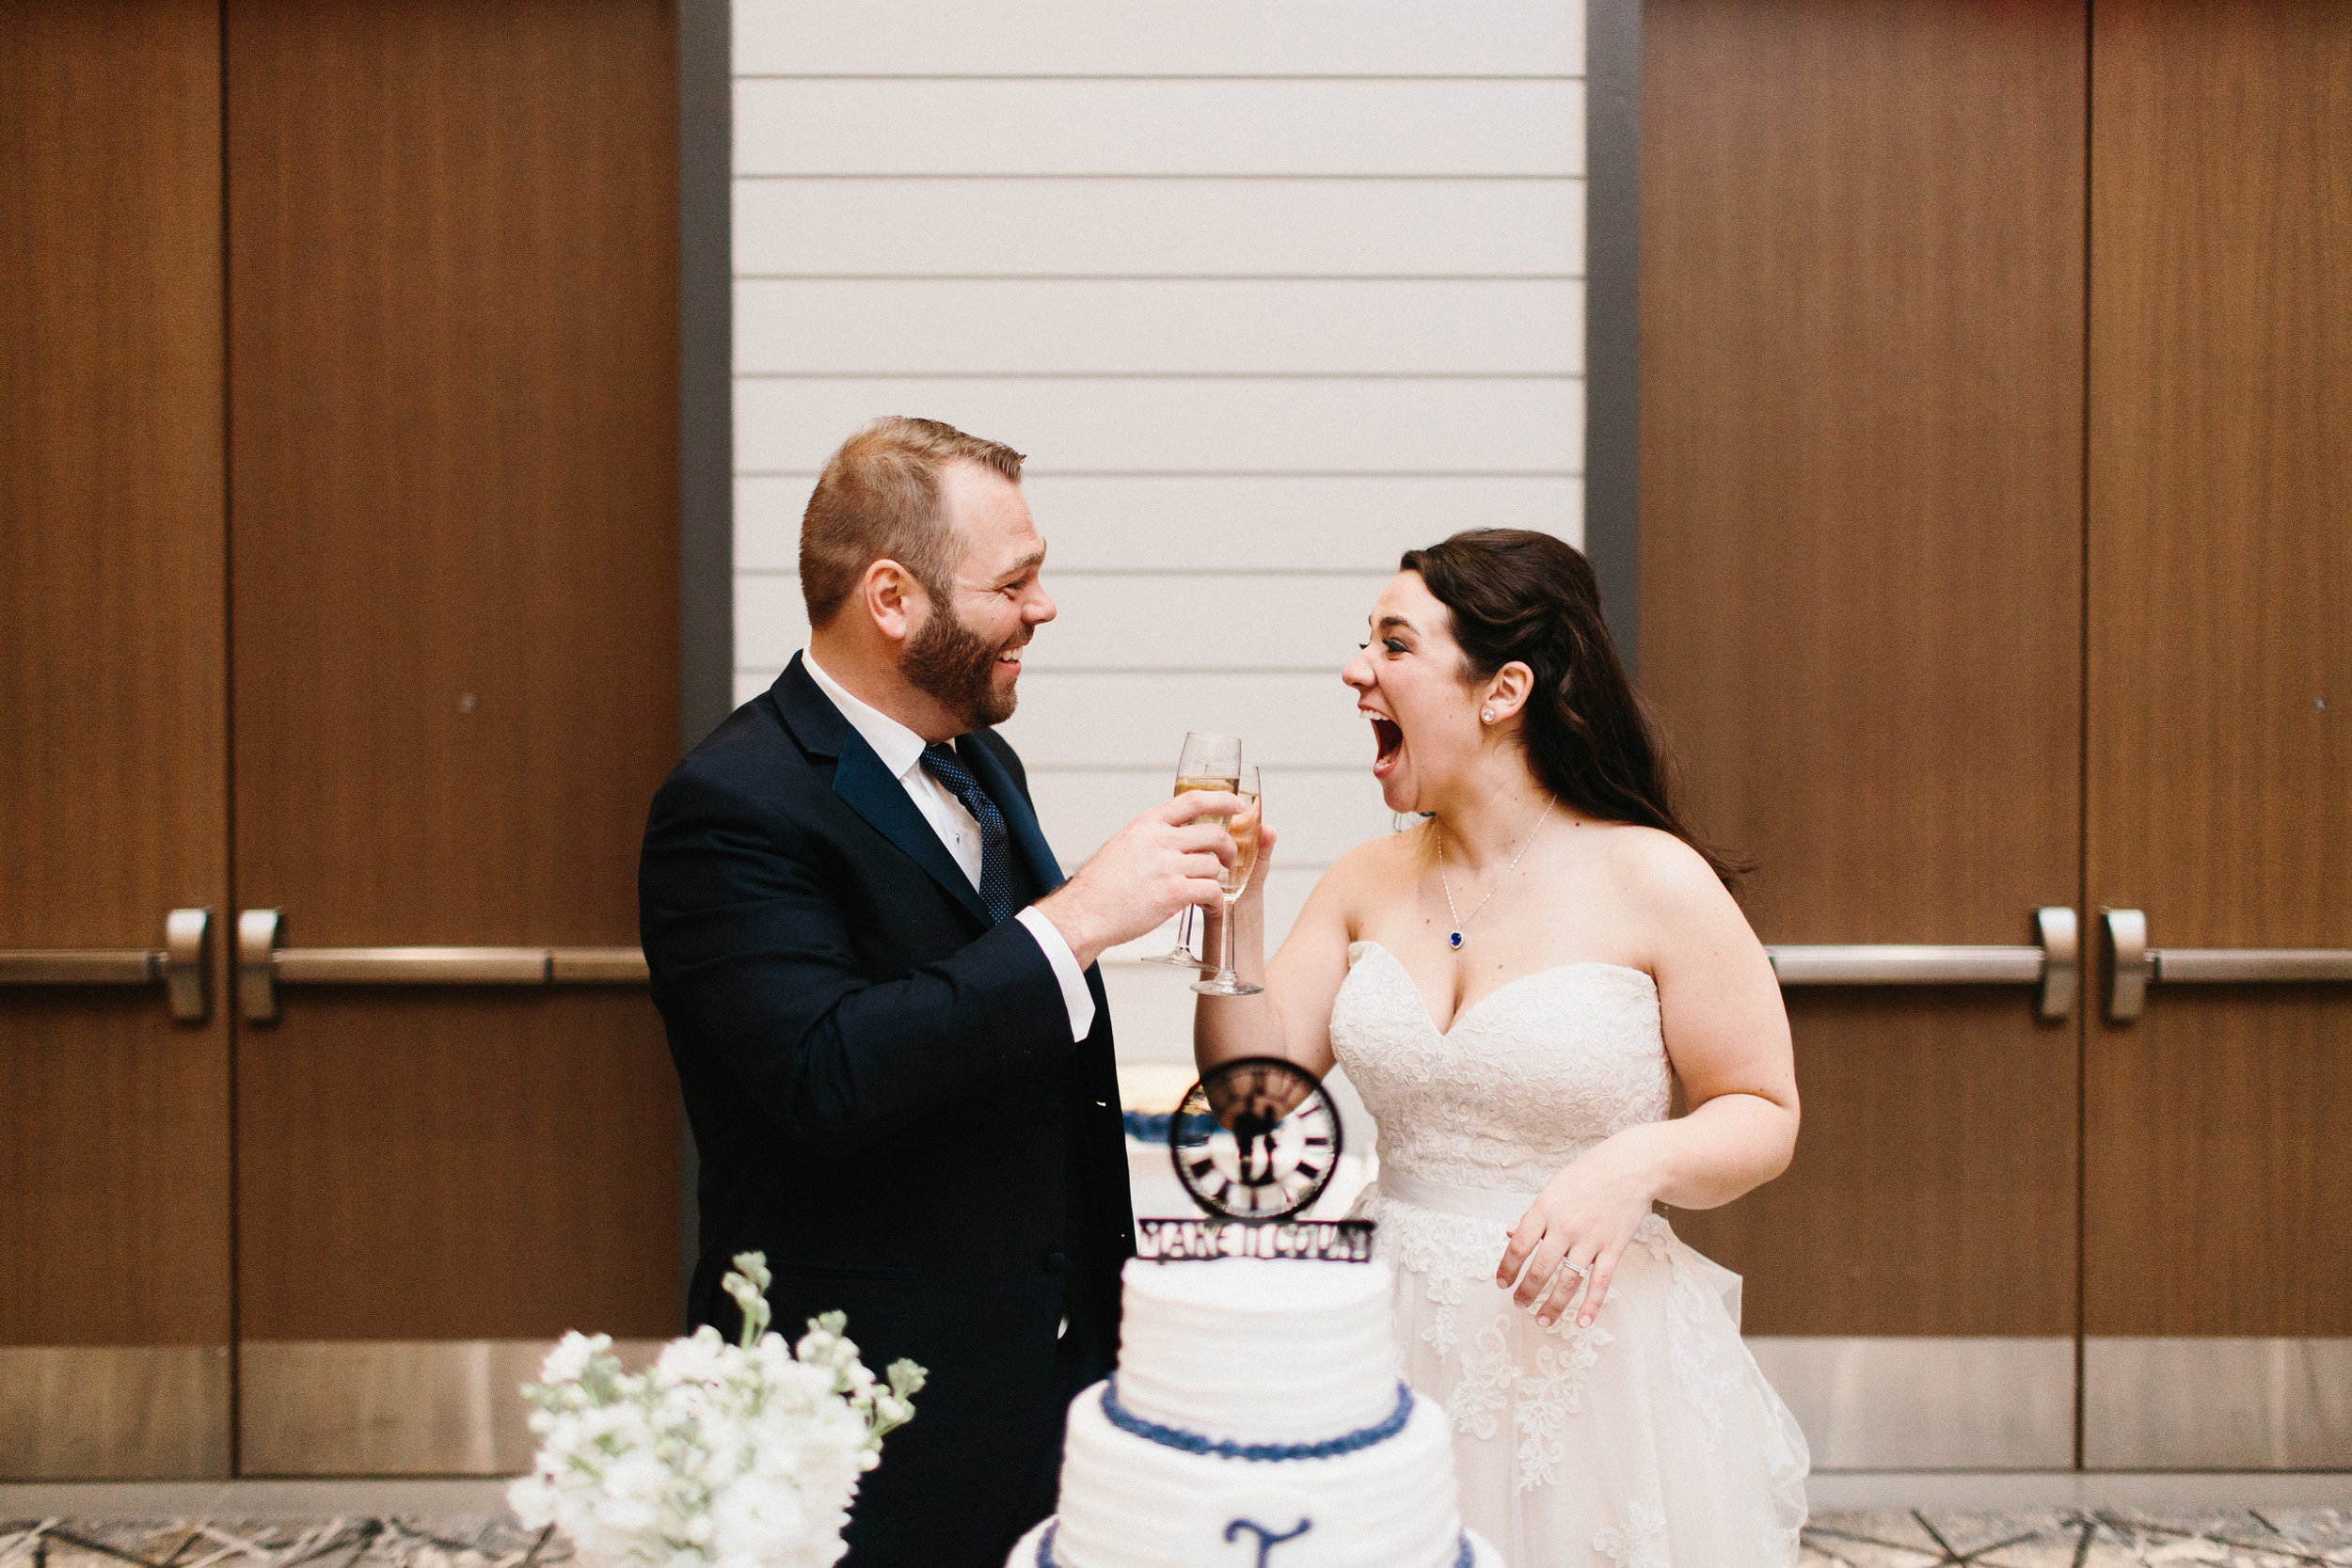 roswell_st_peter_chanel_catholic_avalon_hotel_alpharetta_wedding-2103.jpg